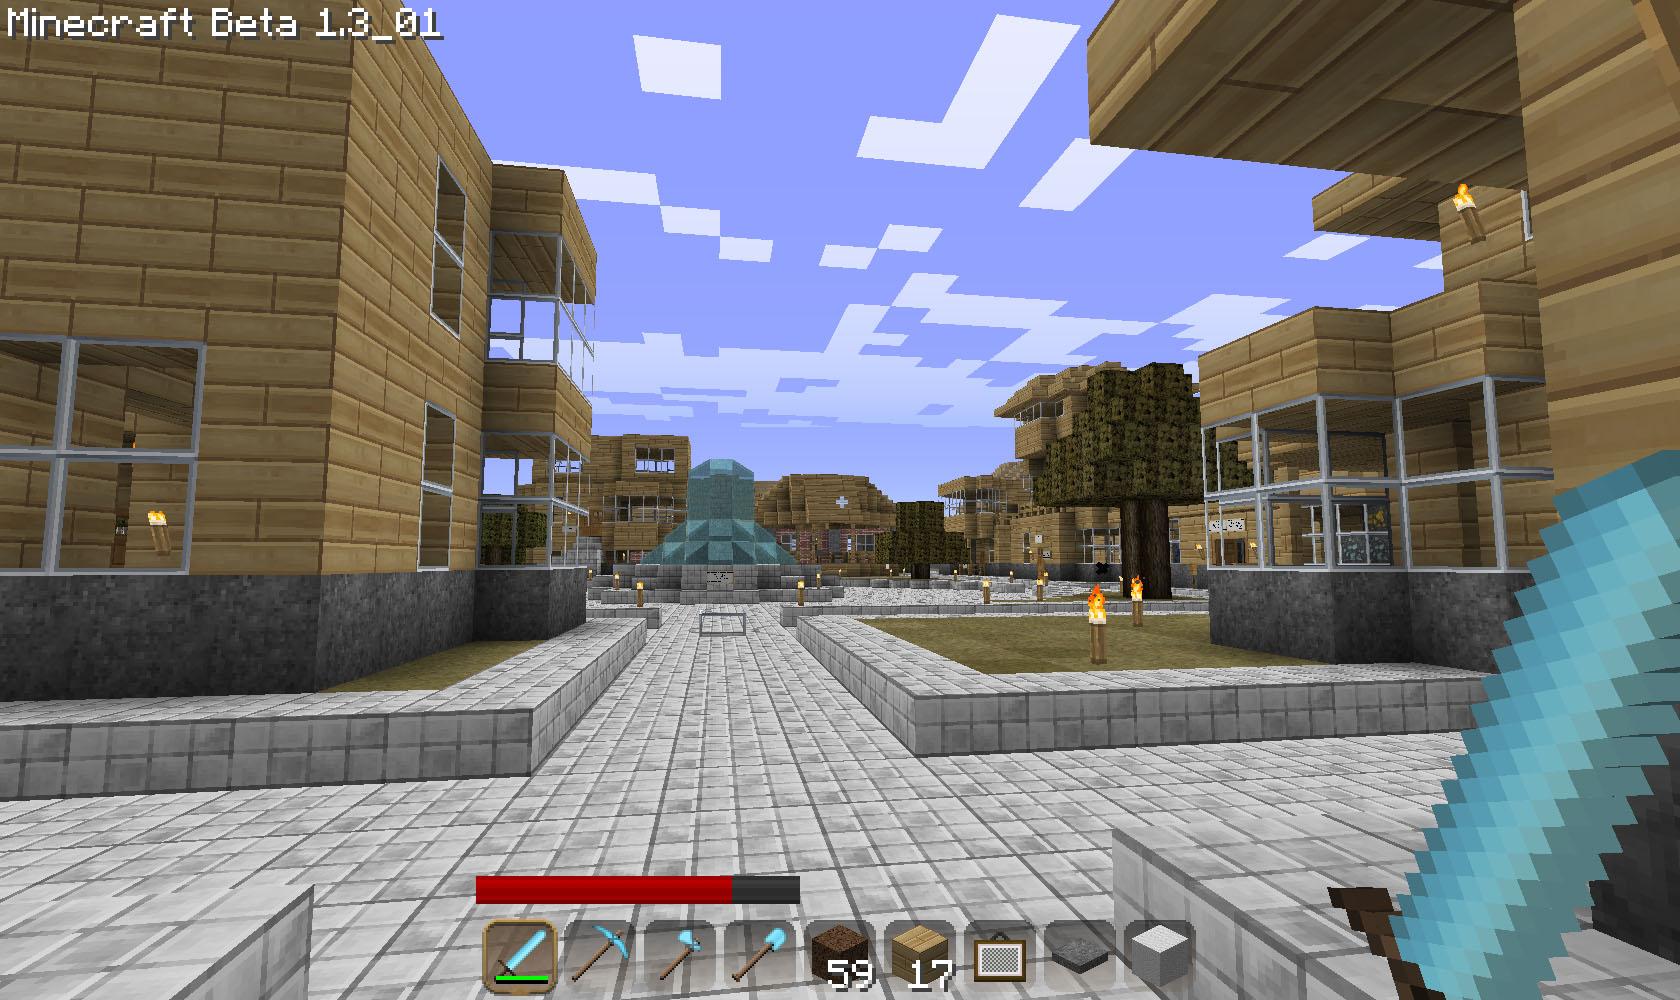 MyCraft Minecraftfr